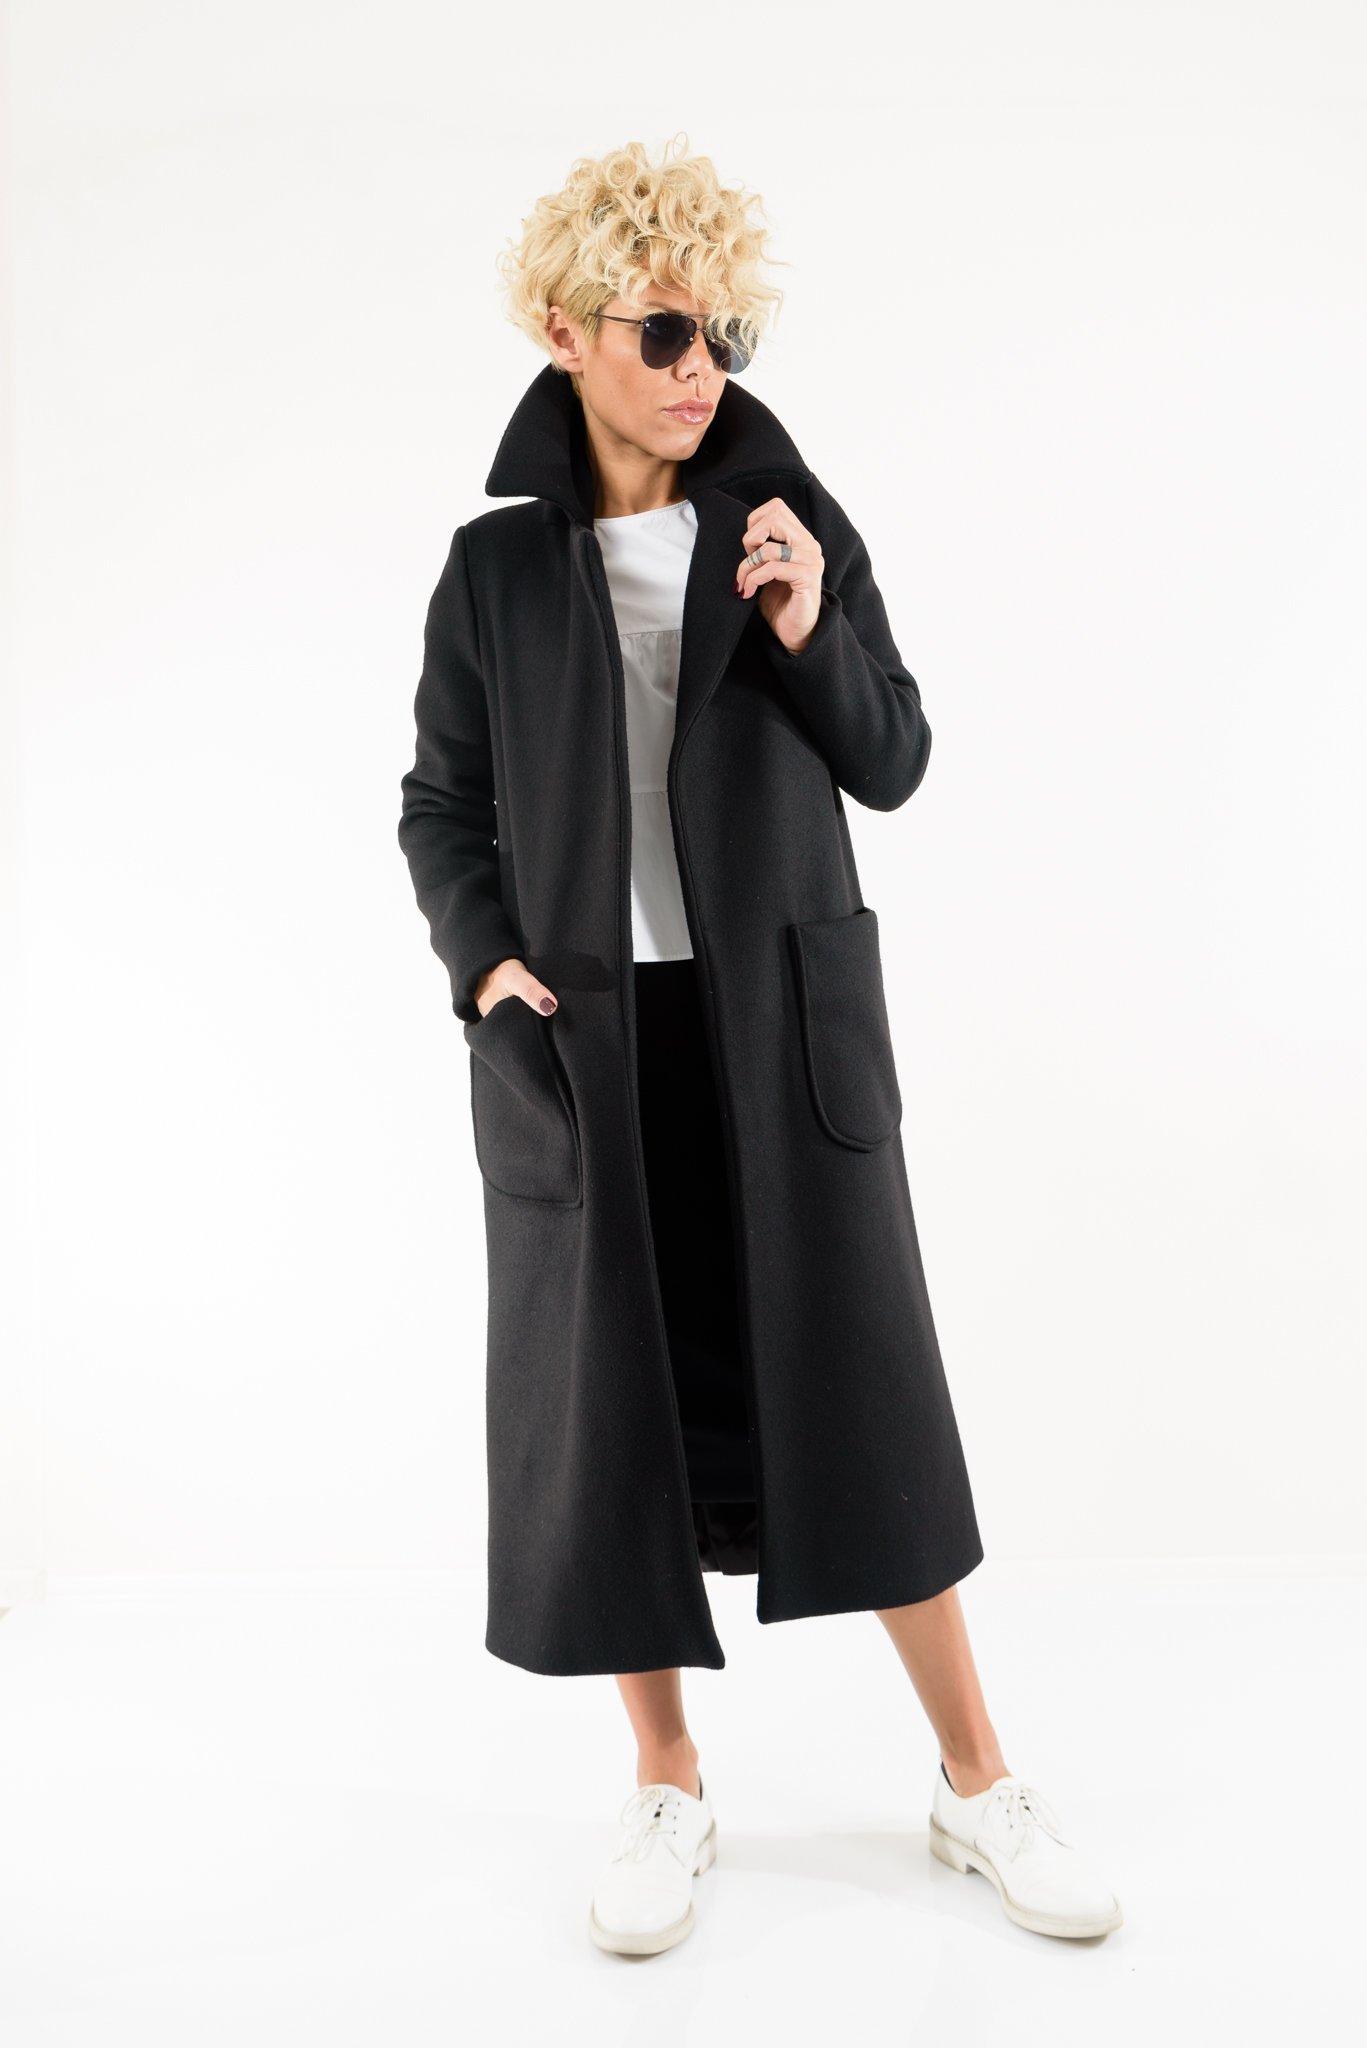 LOCKERROOM Women Extravagant Black Loose Maxi Coat With Big Front Pockets High Collar and lining